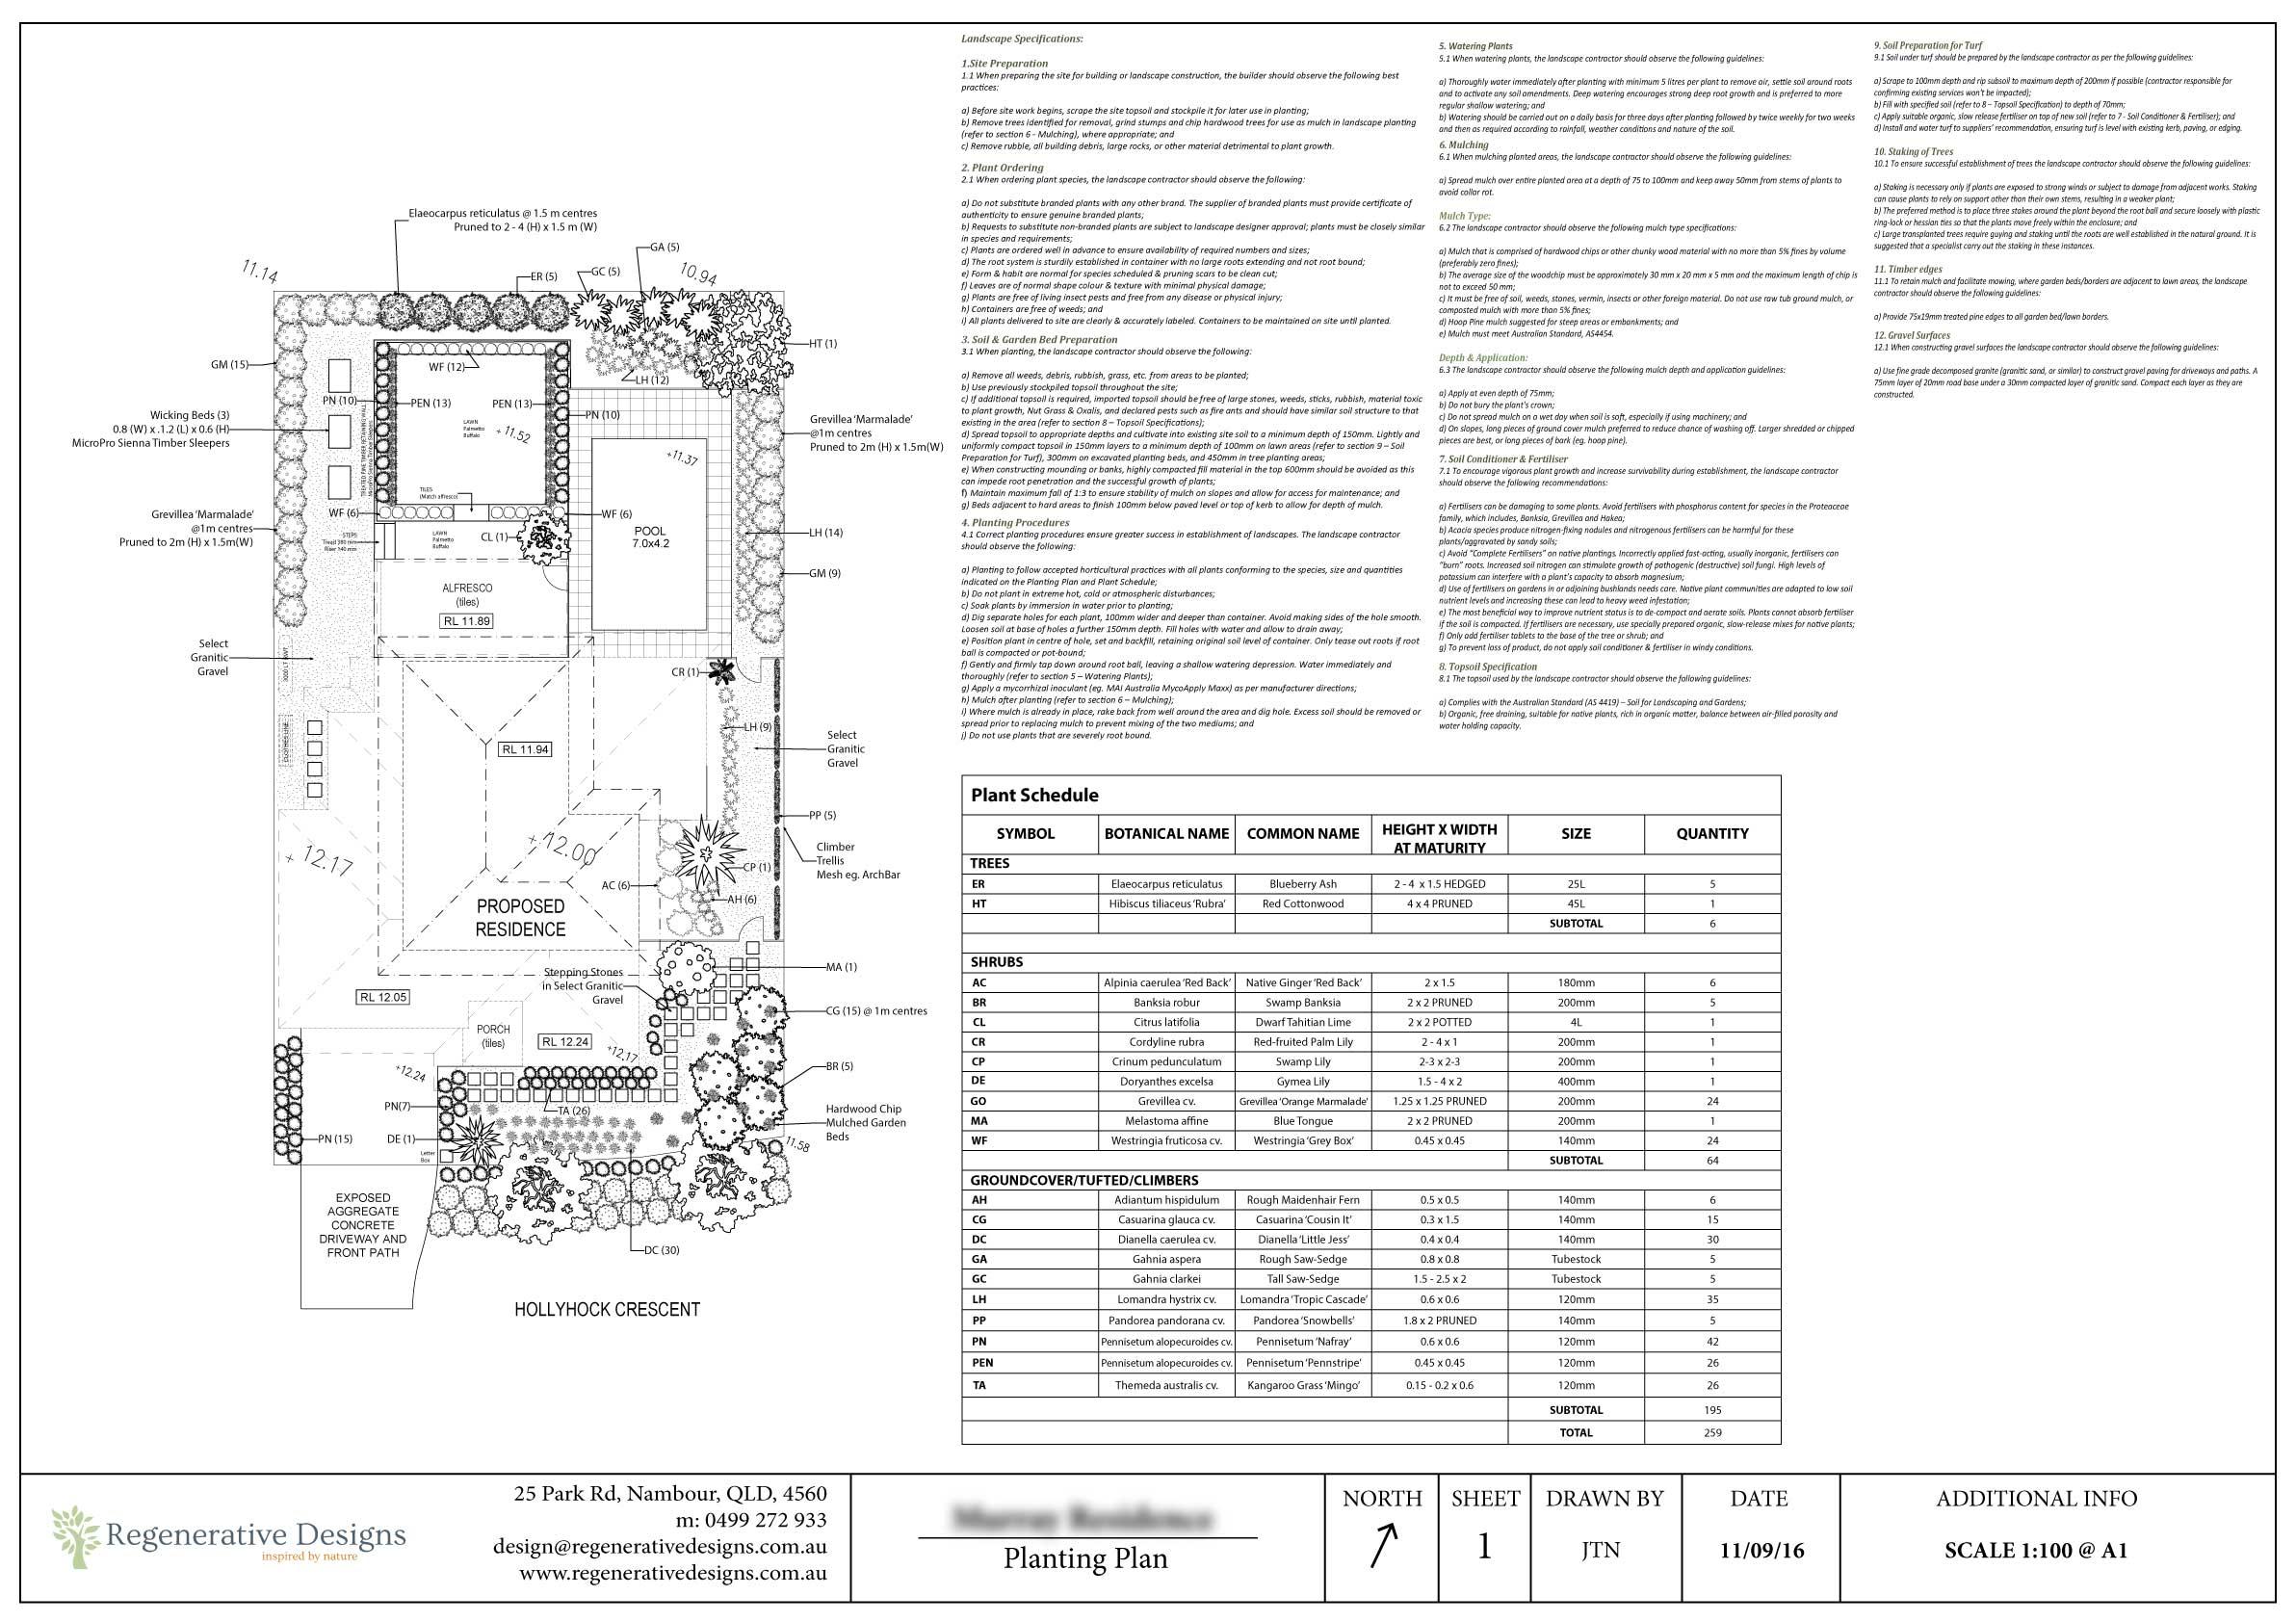 Australian Native Garden Planting Plan Noosa Heads.jpg